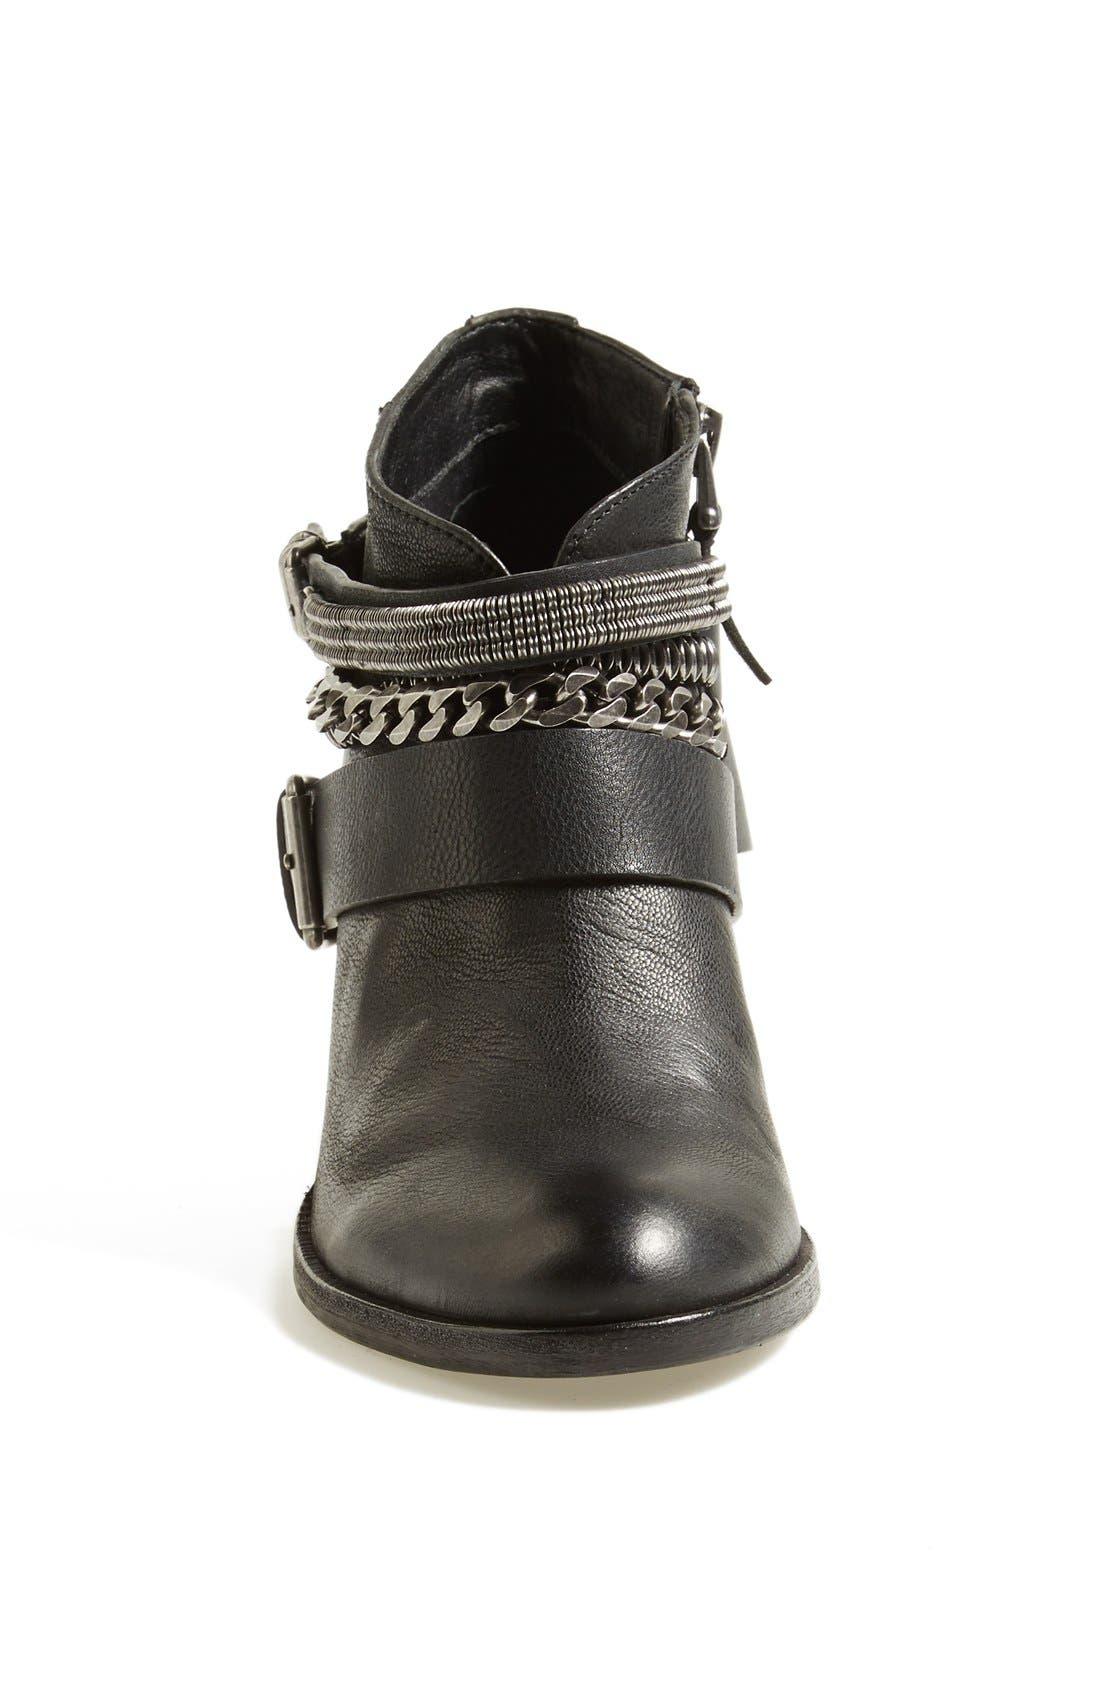 DOLCE VITA, 'Yazmina' Leather Bootie, Alternate thumbnail 3, color, 019